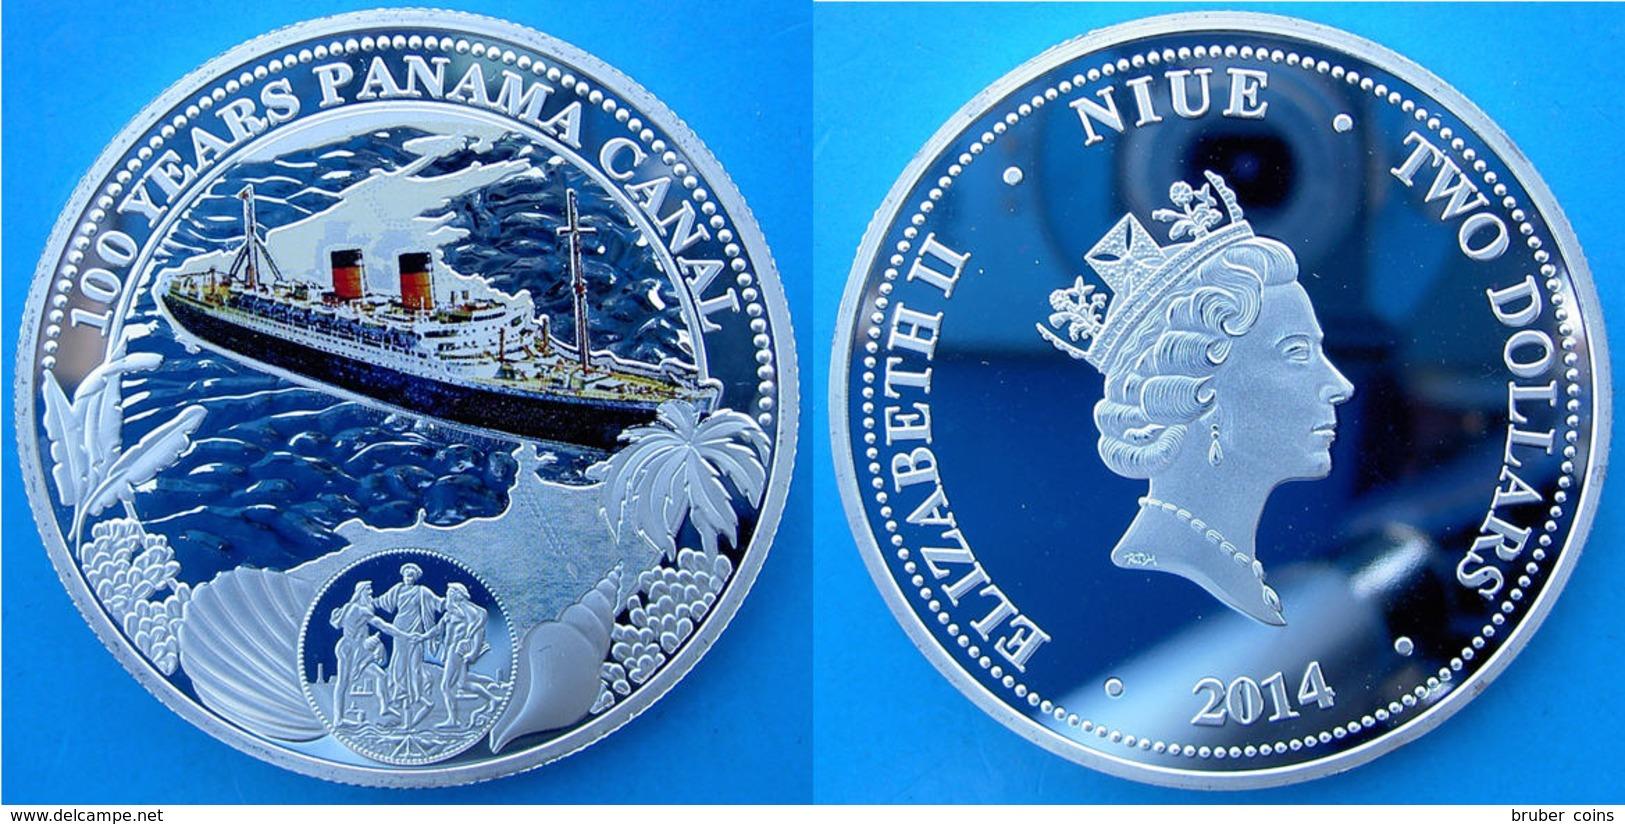 NIUE 2 DOLLARI 2014 100 ANNI CANALE DI PANAMA FONDO SPECCHIO NICHEL COLORED  DIAMETRO 5 CM SOUVENIR - Niue